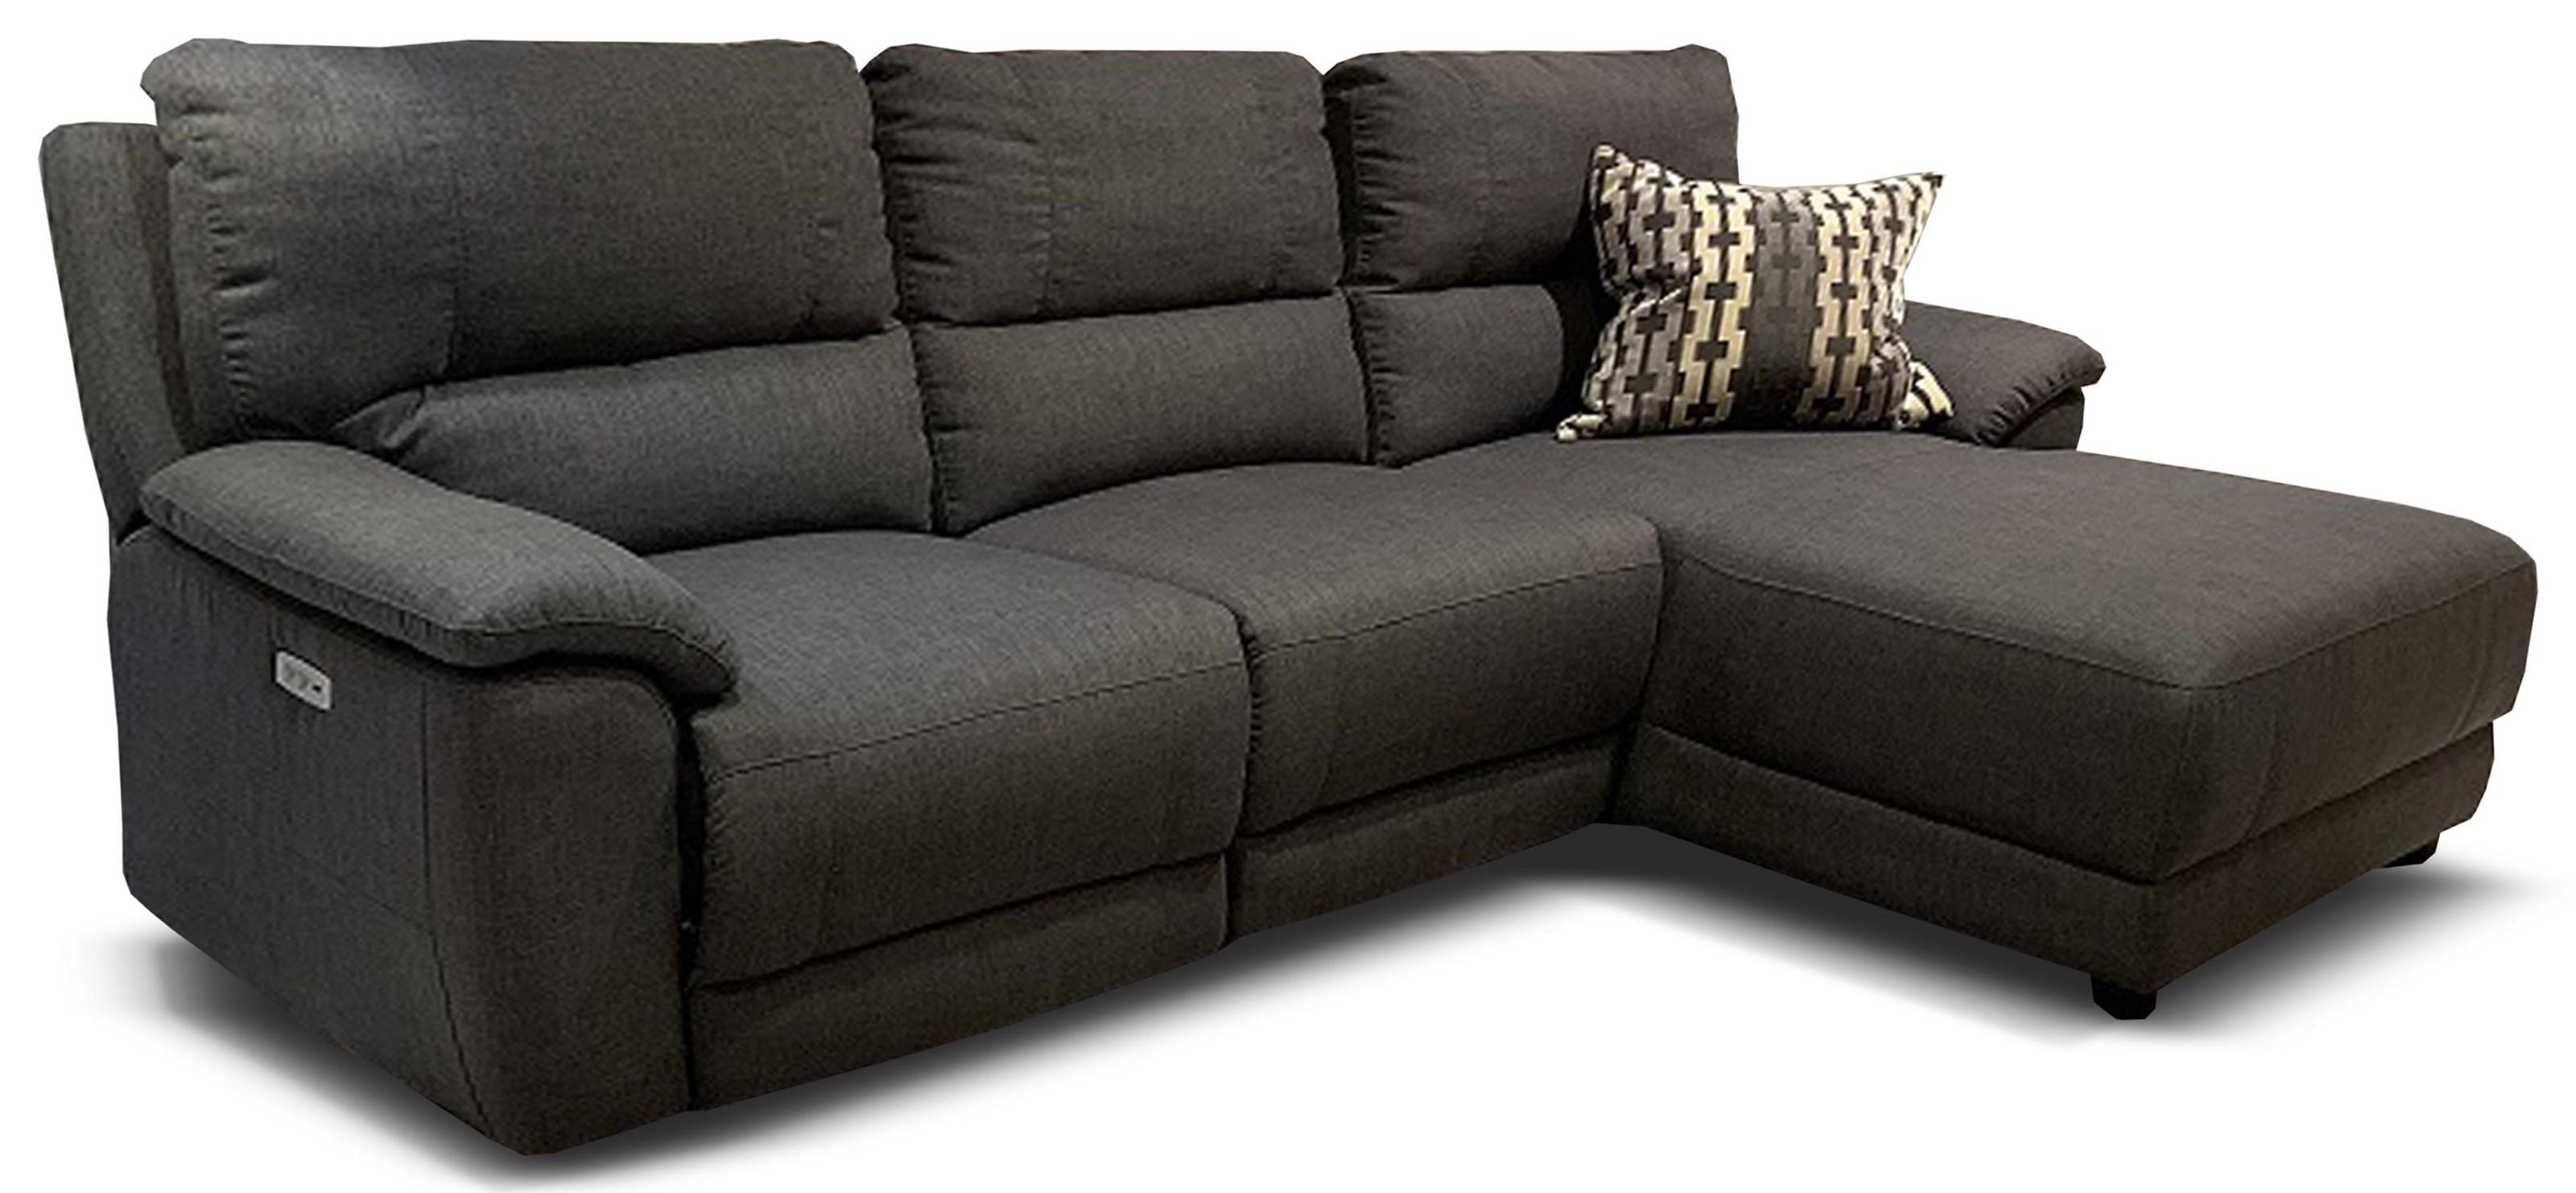 Cullen Cullen Power Sofa Chaise by Abbyson at Morris Home